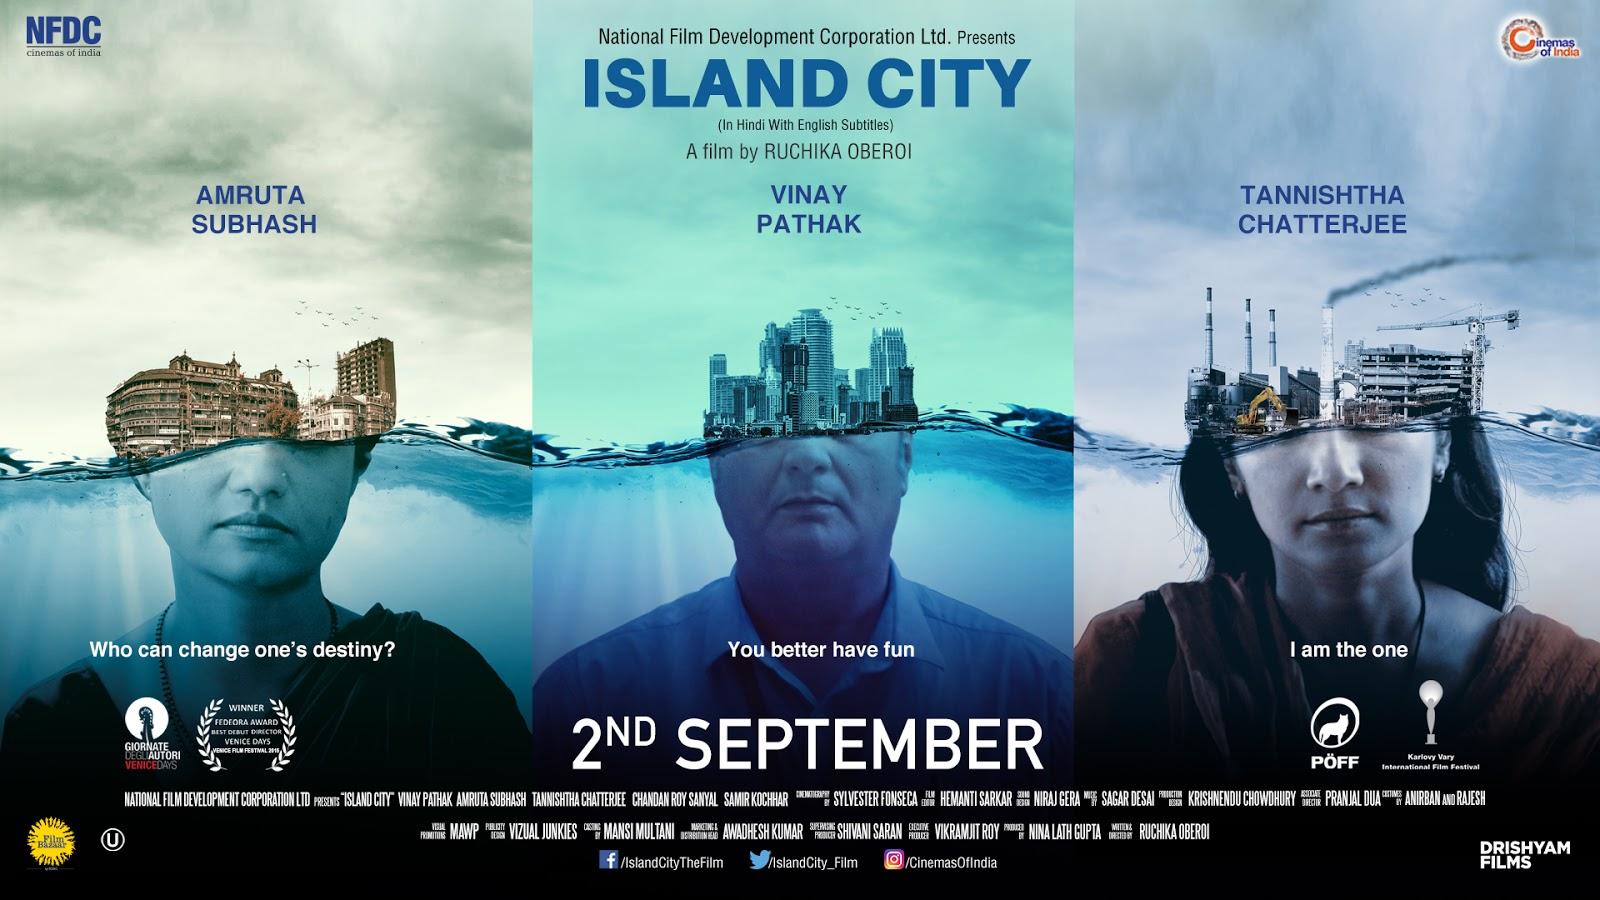 Island City Ruchika Oberoi Trailer